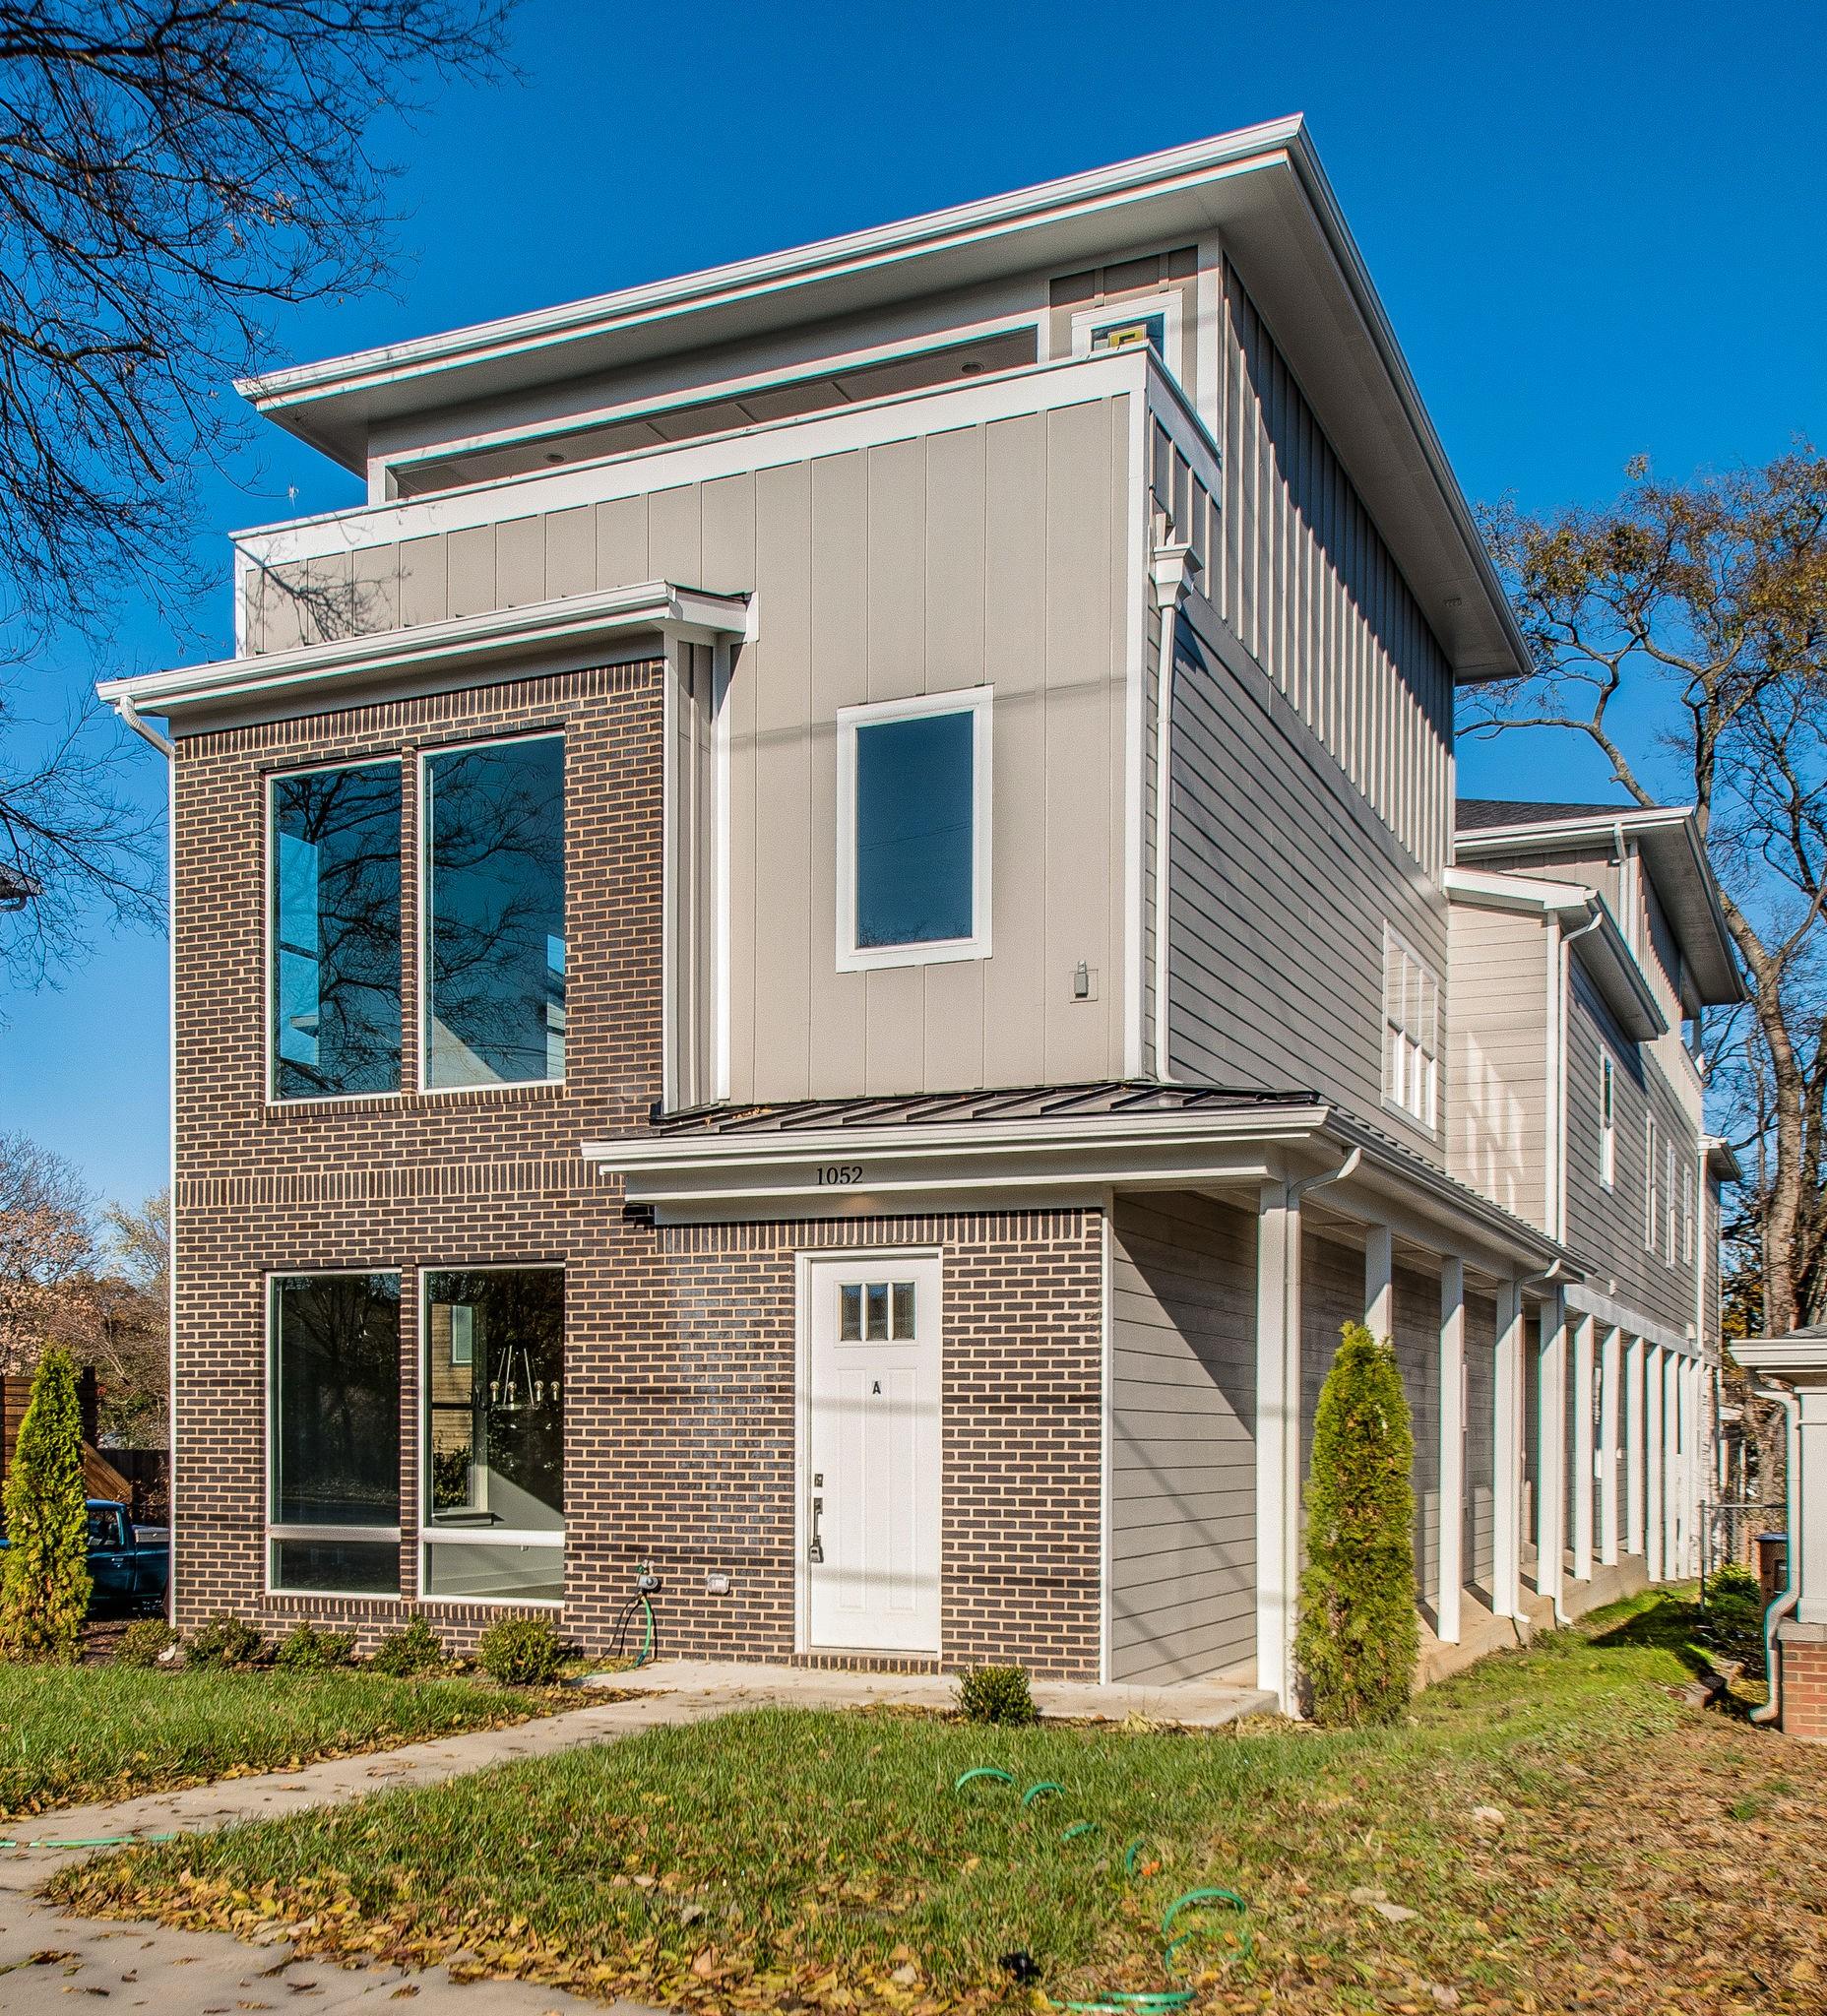 1052A 2nd Ave, S, Nashville, TN 37210 - Nashville, TN real estate listing